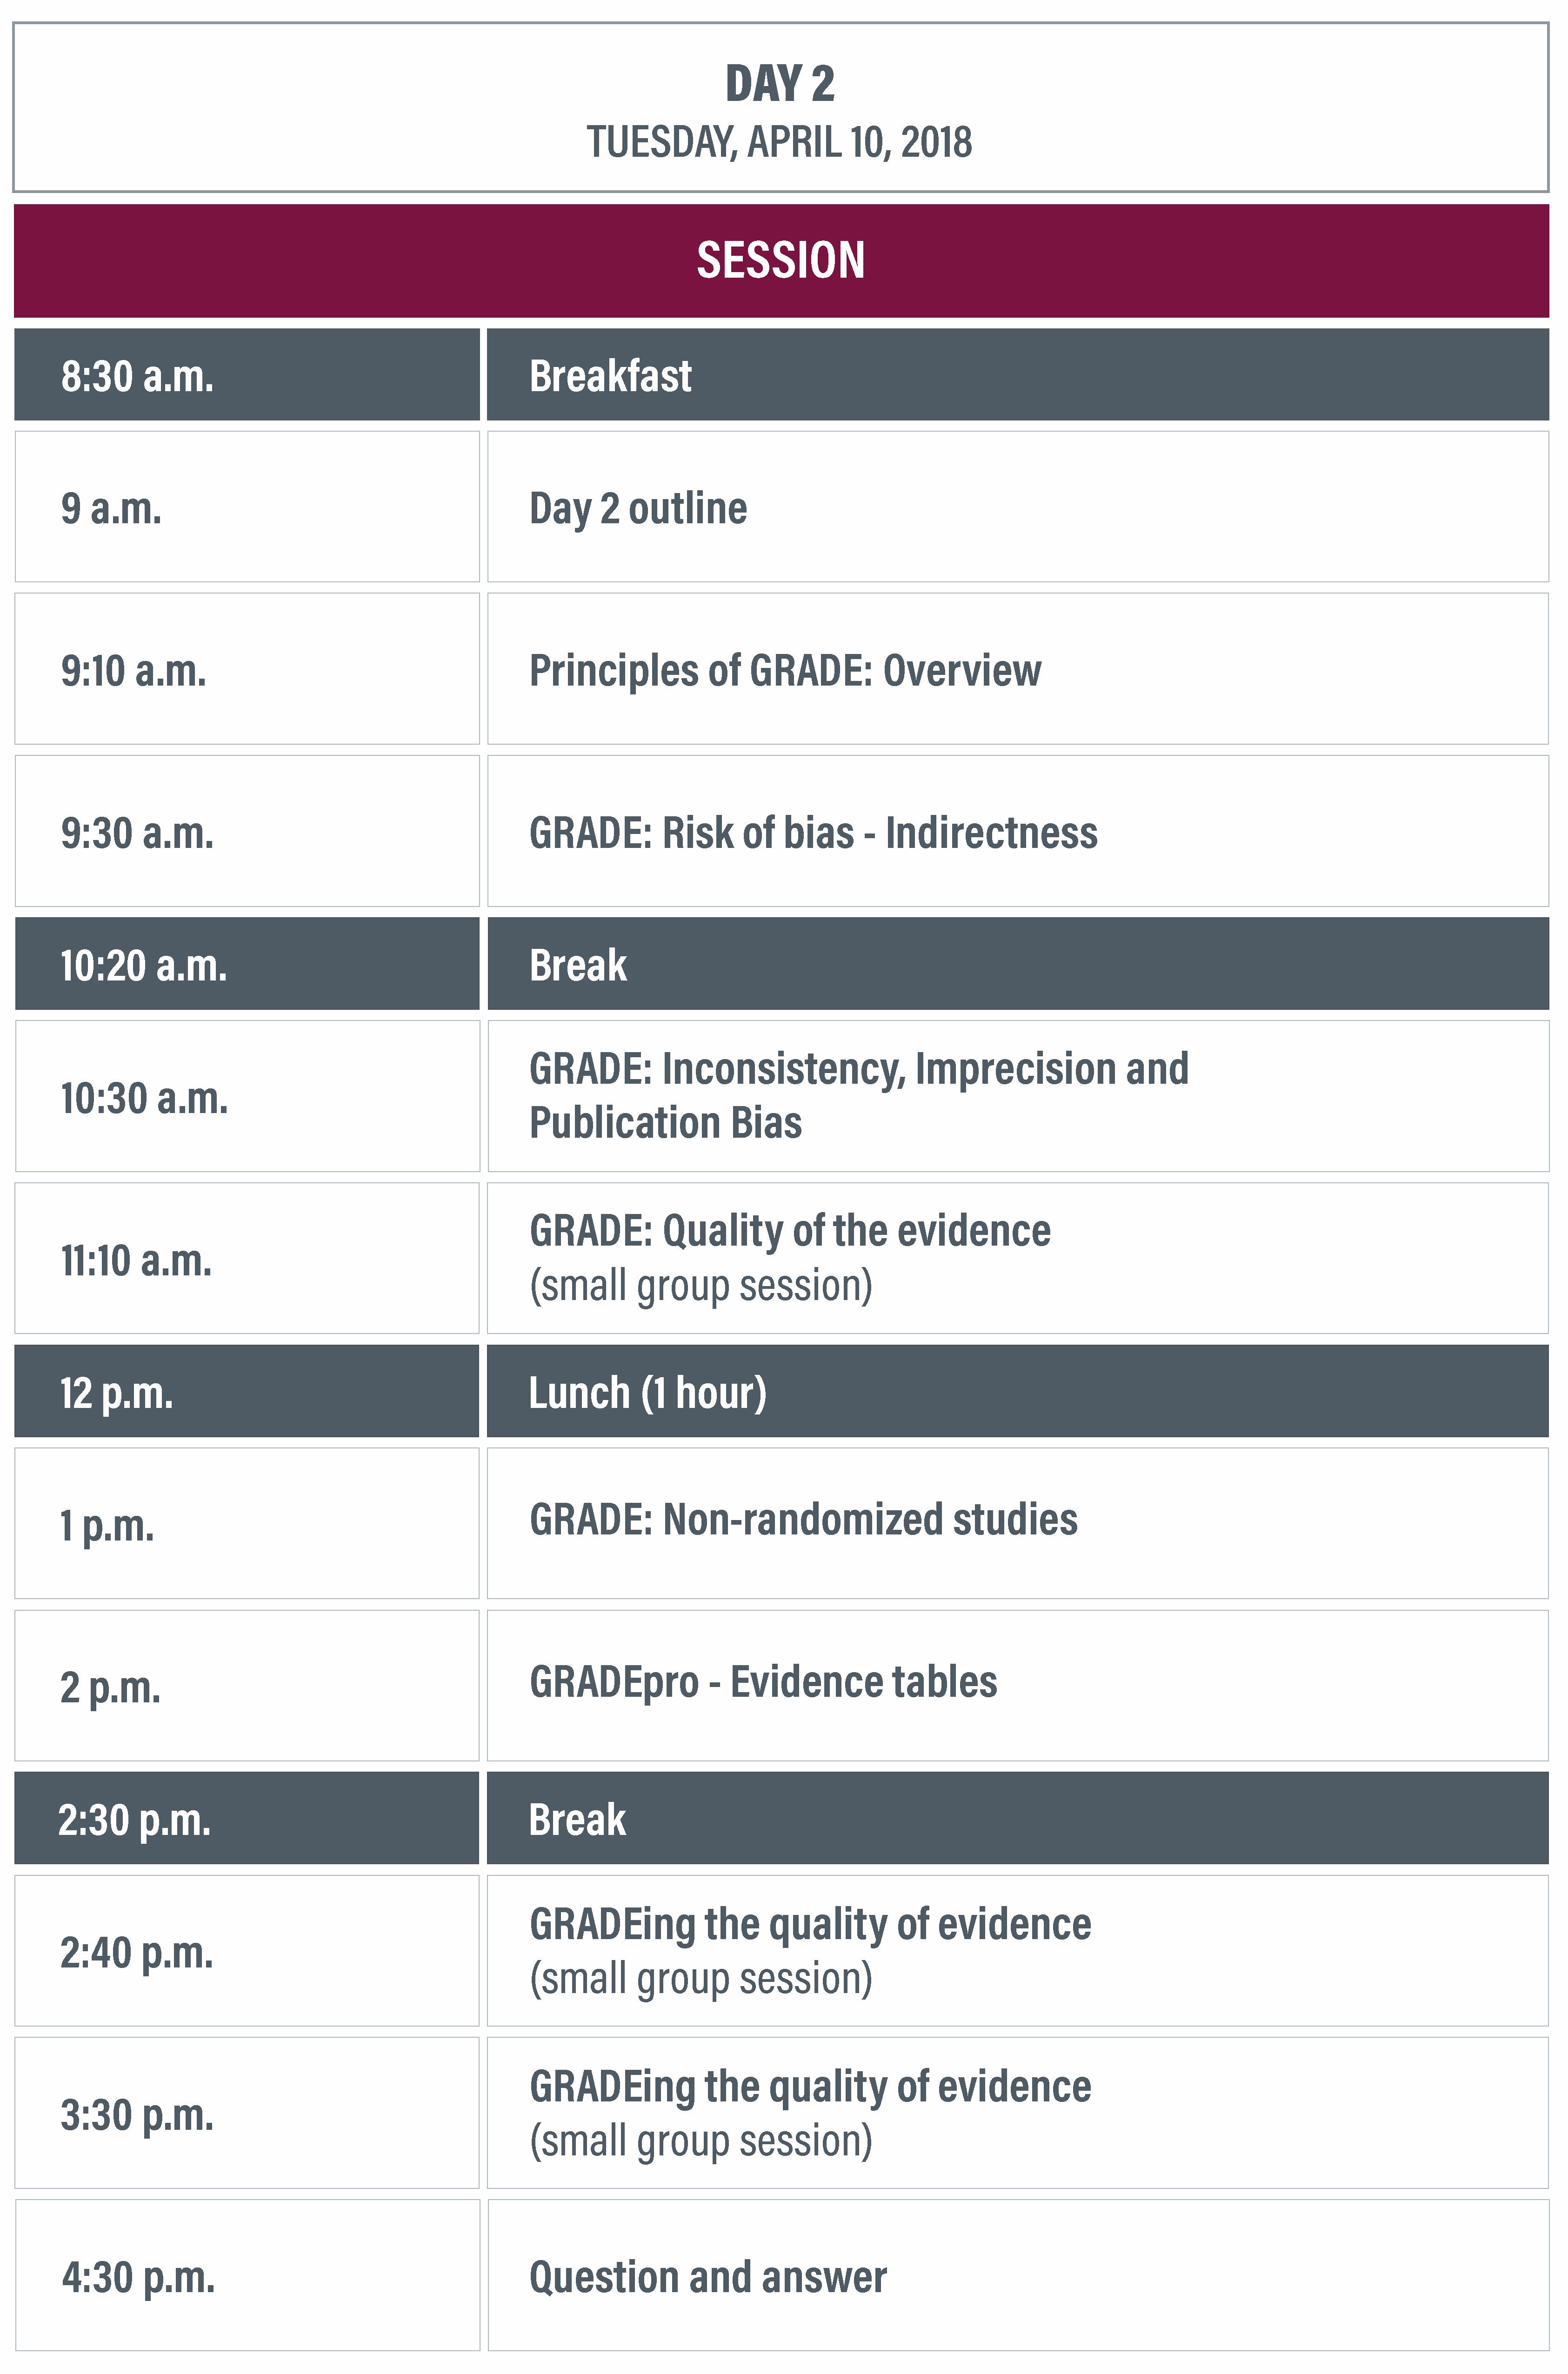 MacGRADE Workshop Program Day 2